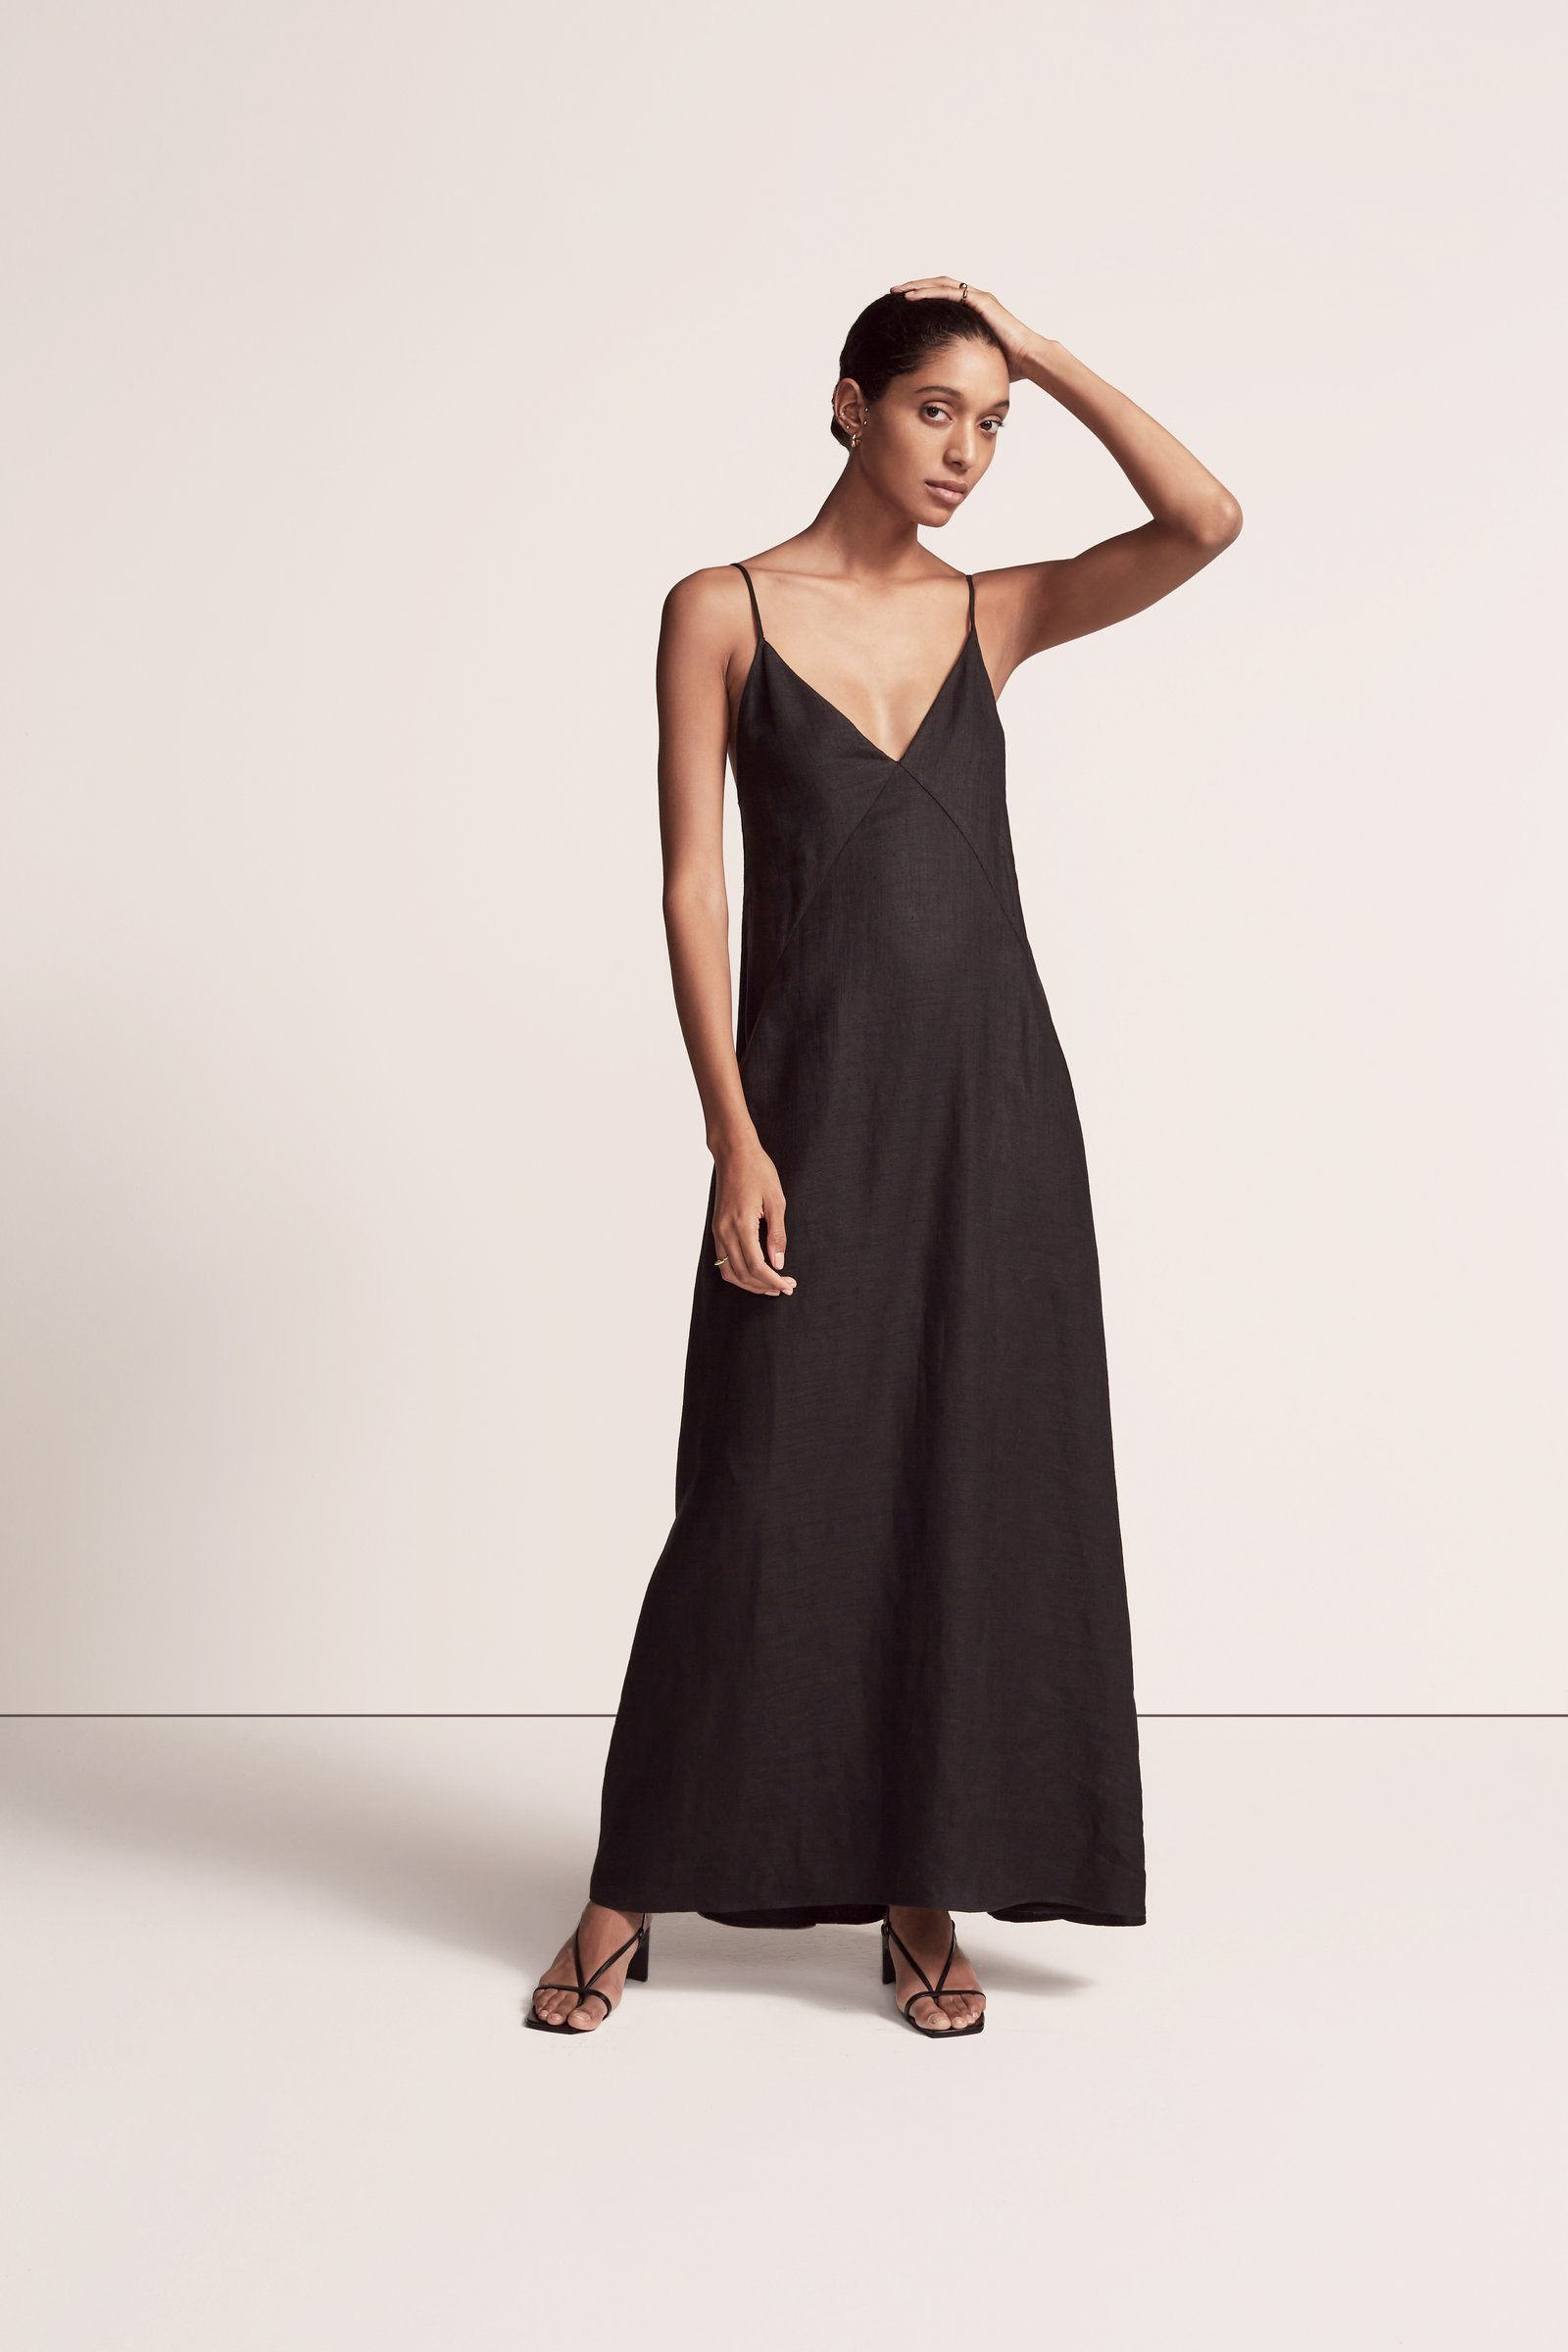 Seamed Slip Dress Another Tomorrow Slip Dress Summer Slip Dress Dresses [ 2400 x 1600 Pixel ]